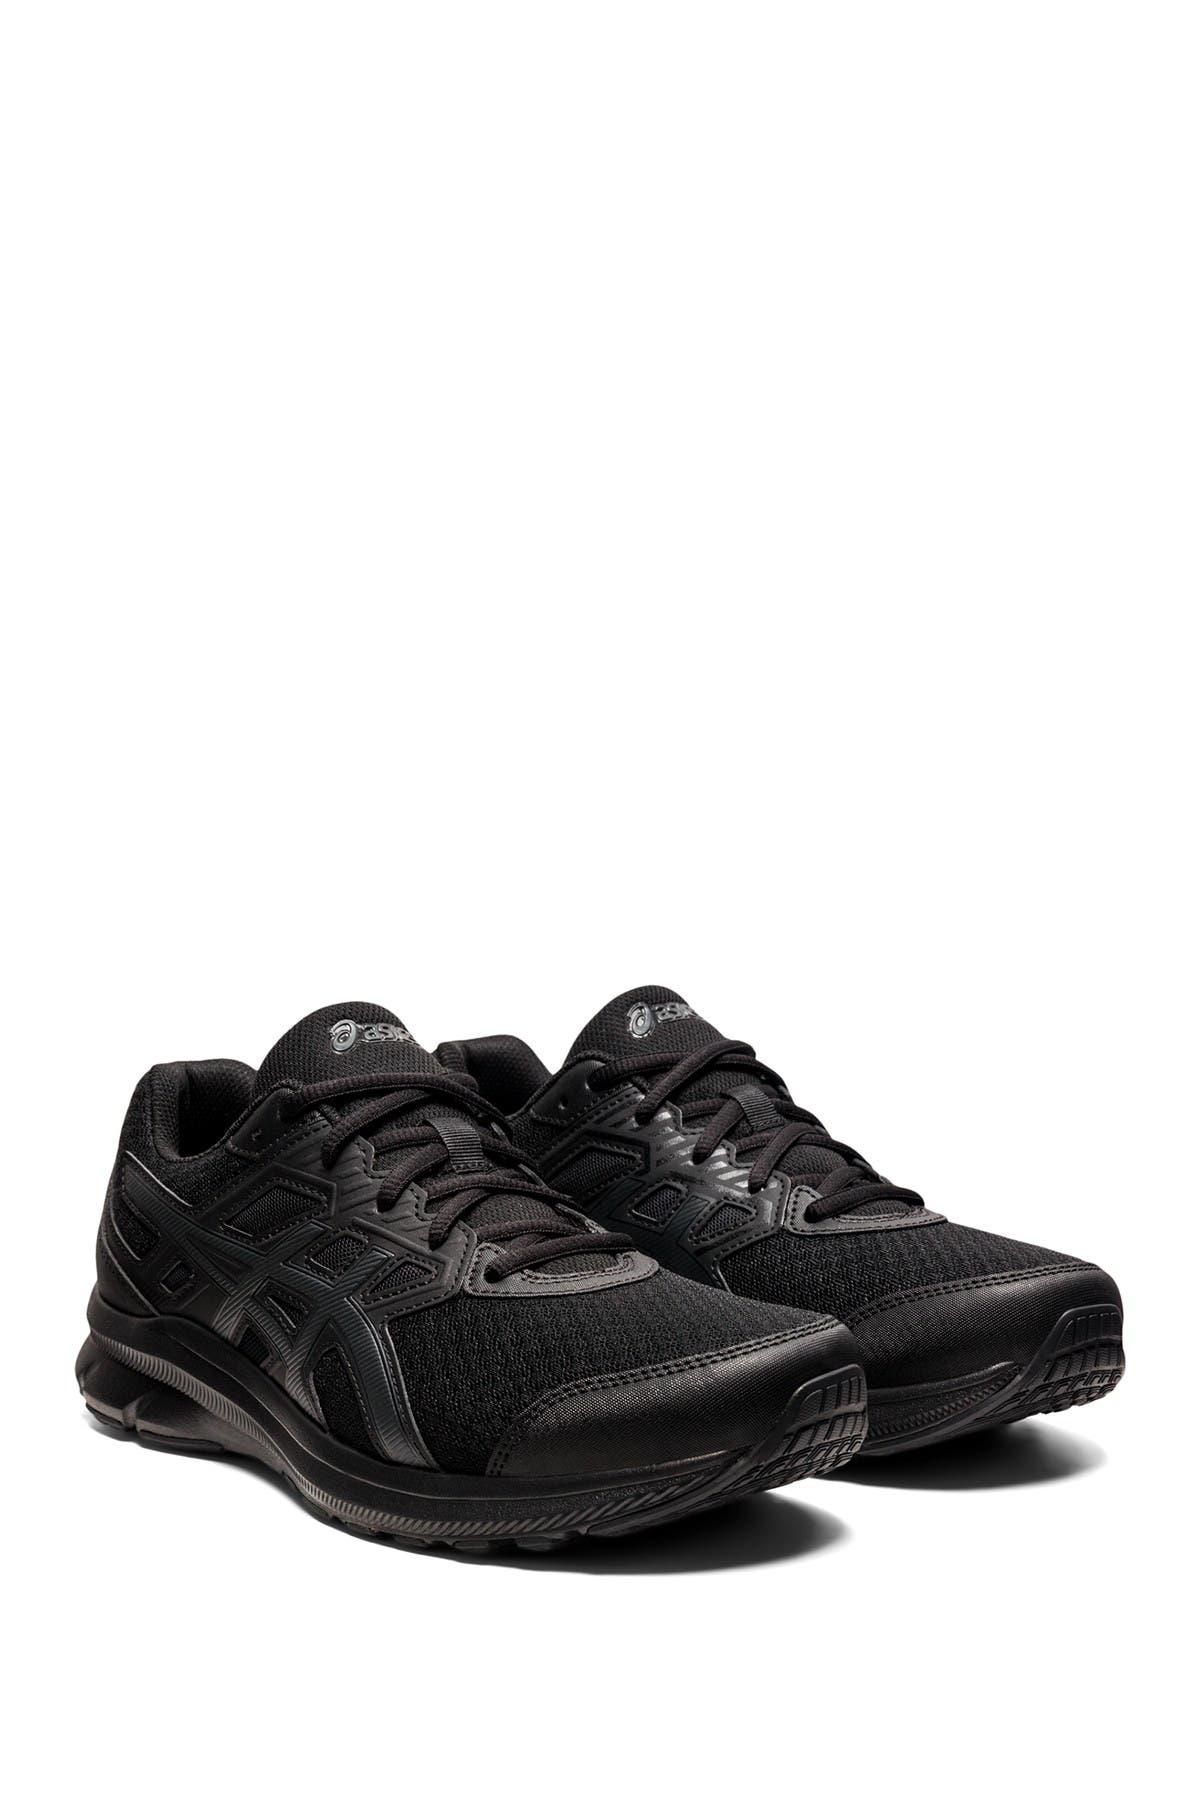 Asics Sneakers JOLT 3 ROAD RUNNING SHOE